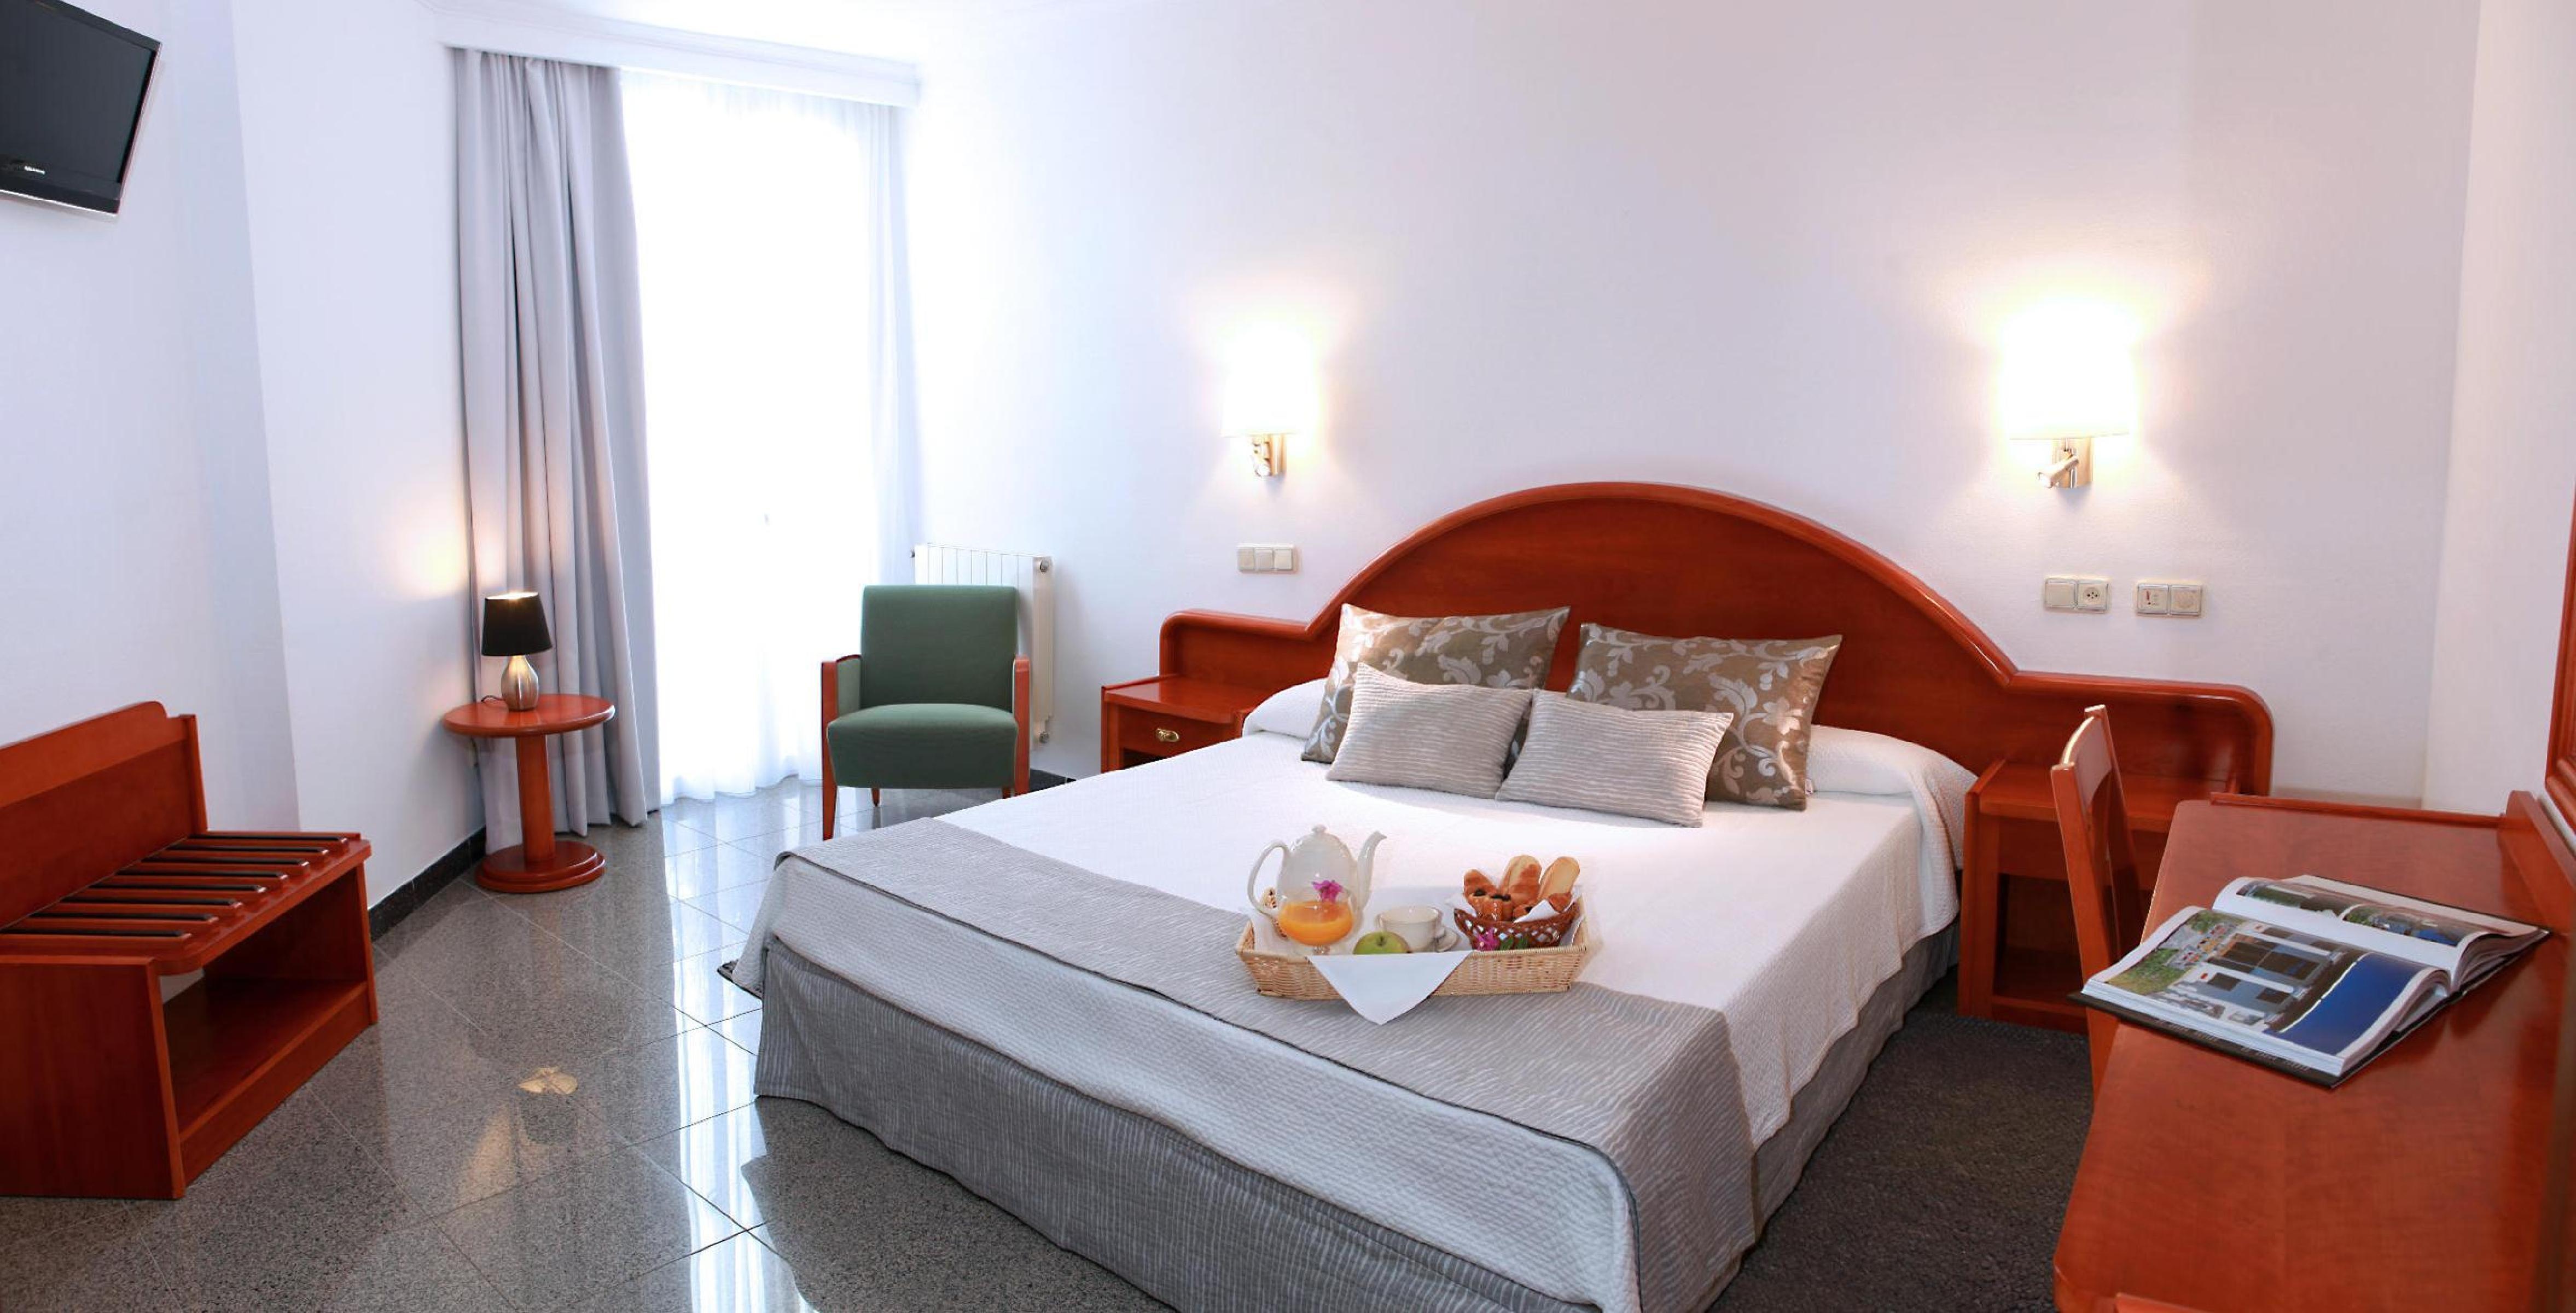 Suitehotel S'Argamassa Palace